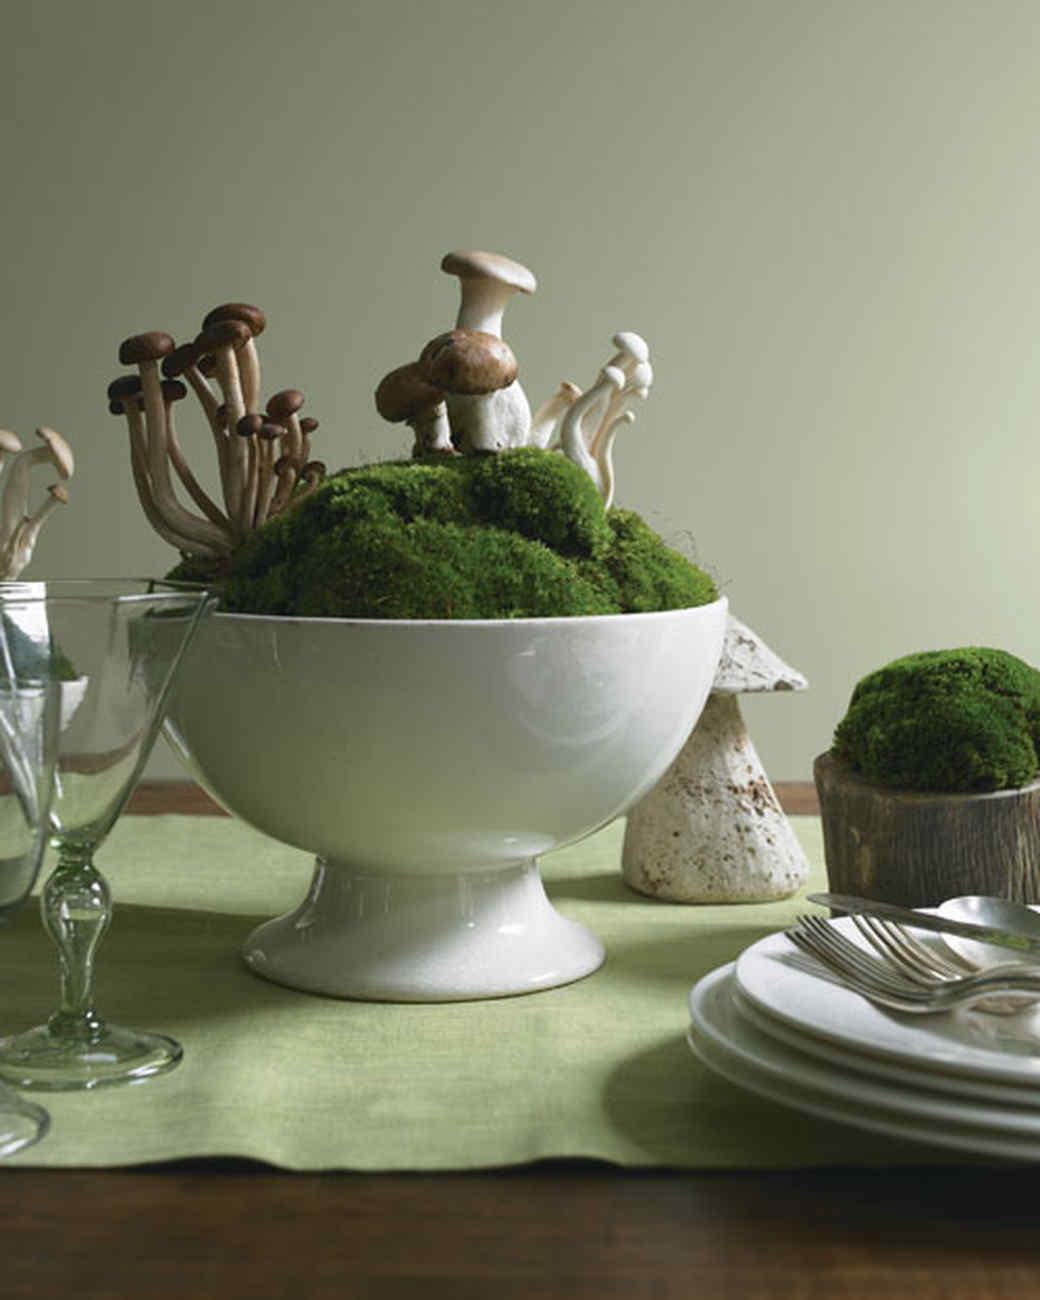 mld103117_0408_mushroom.jpg